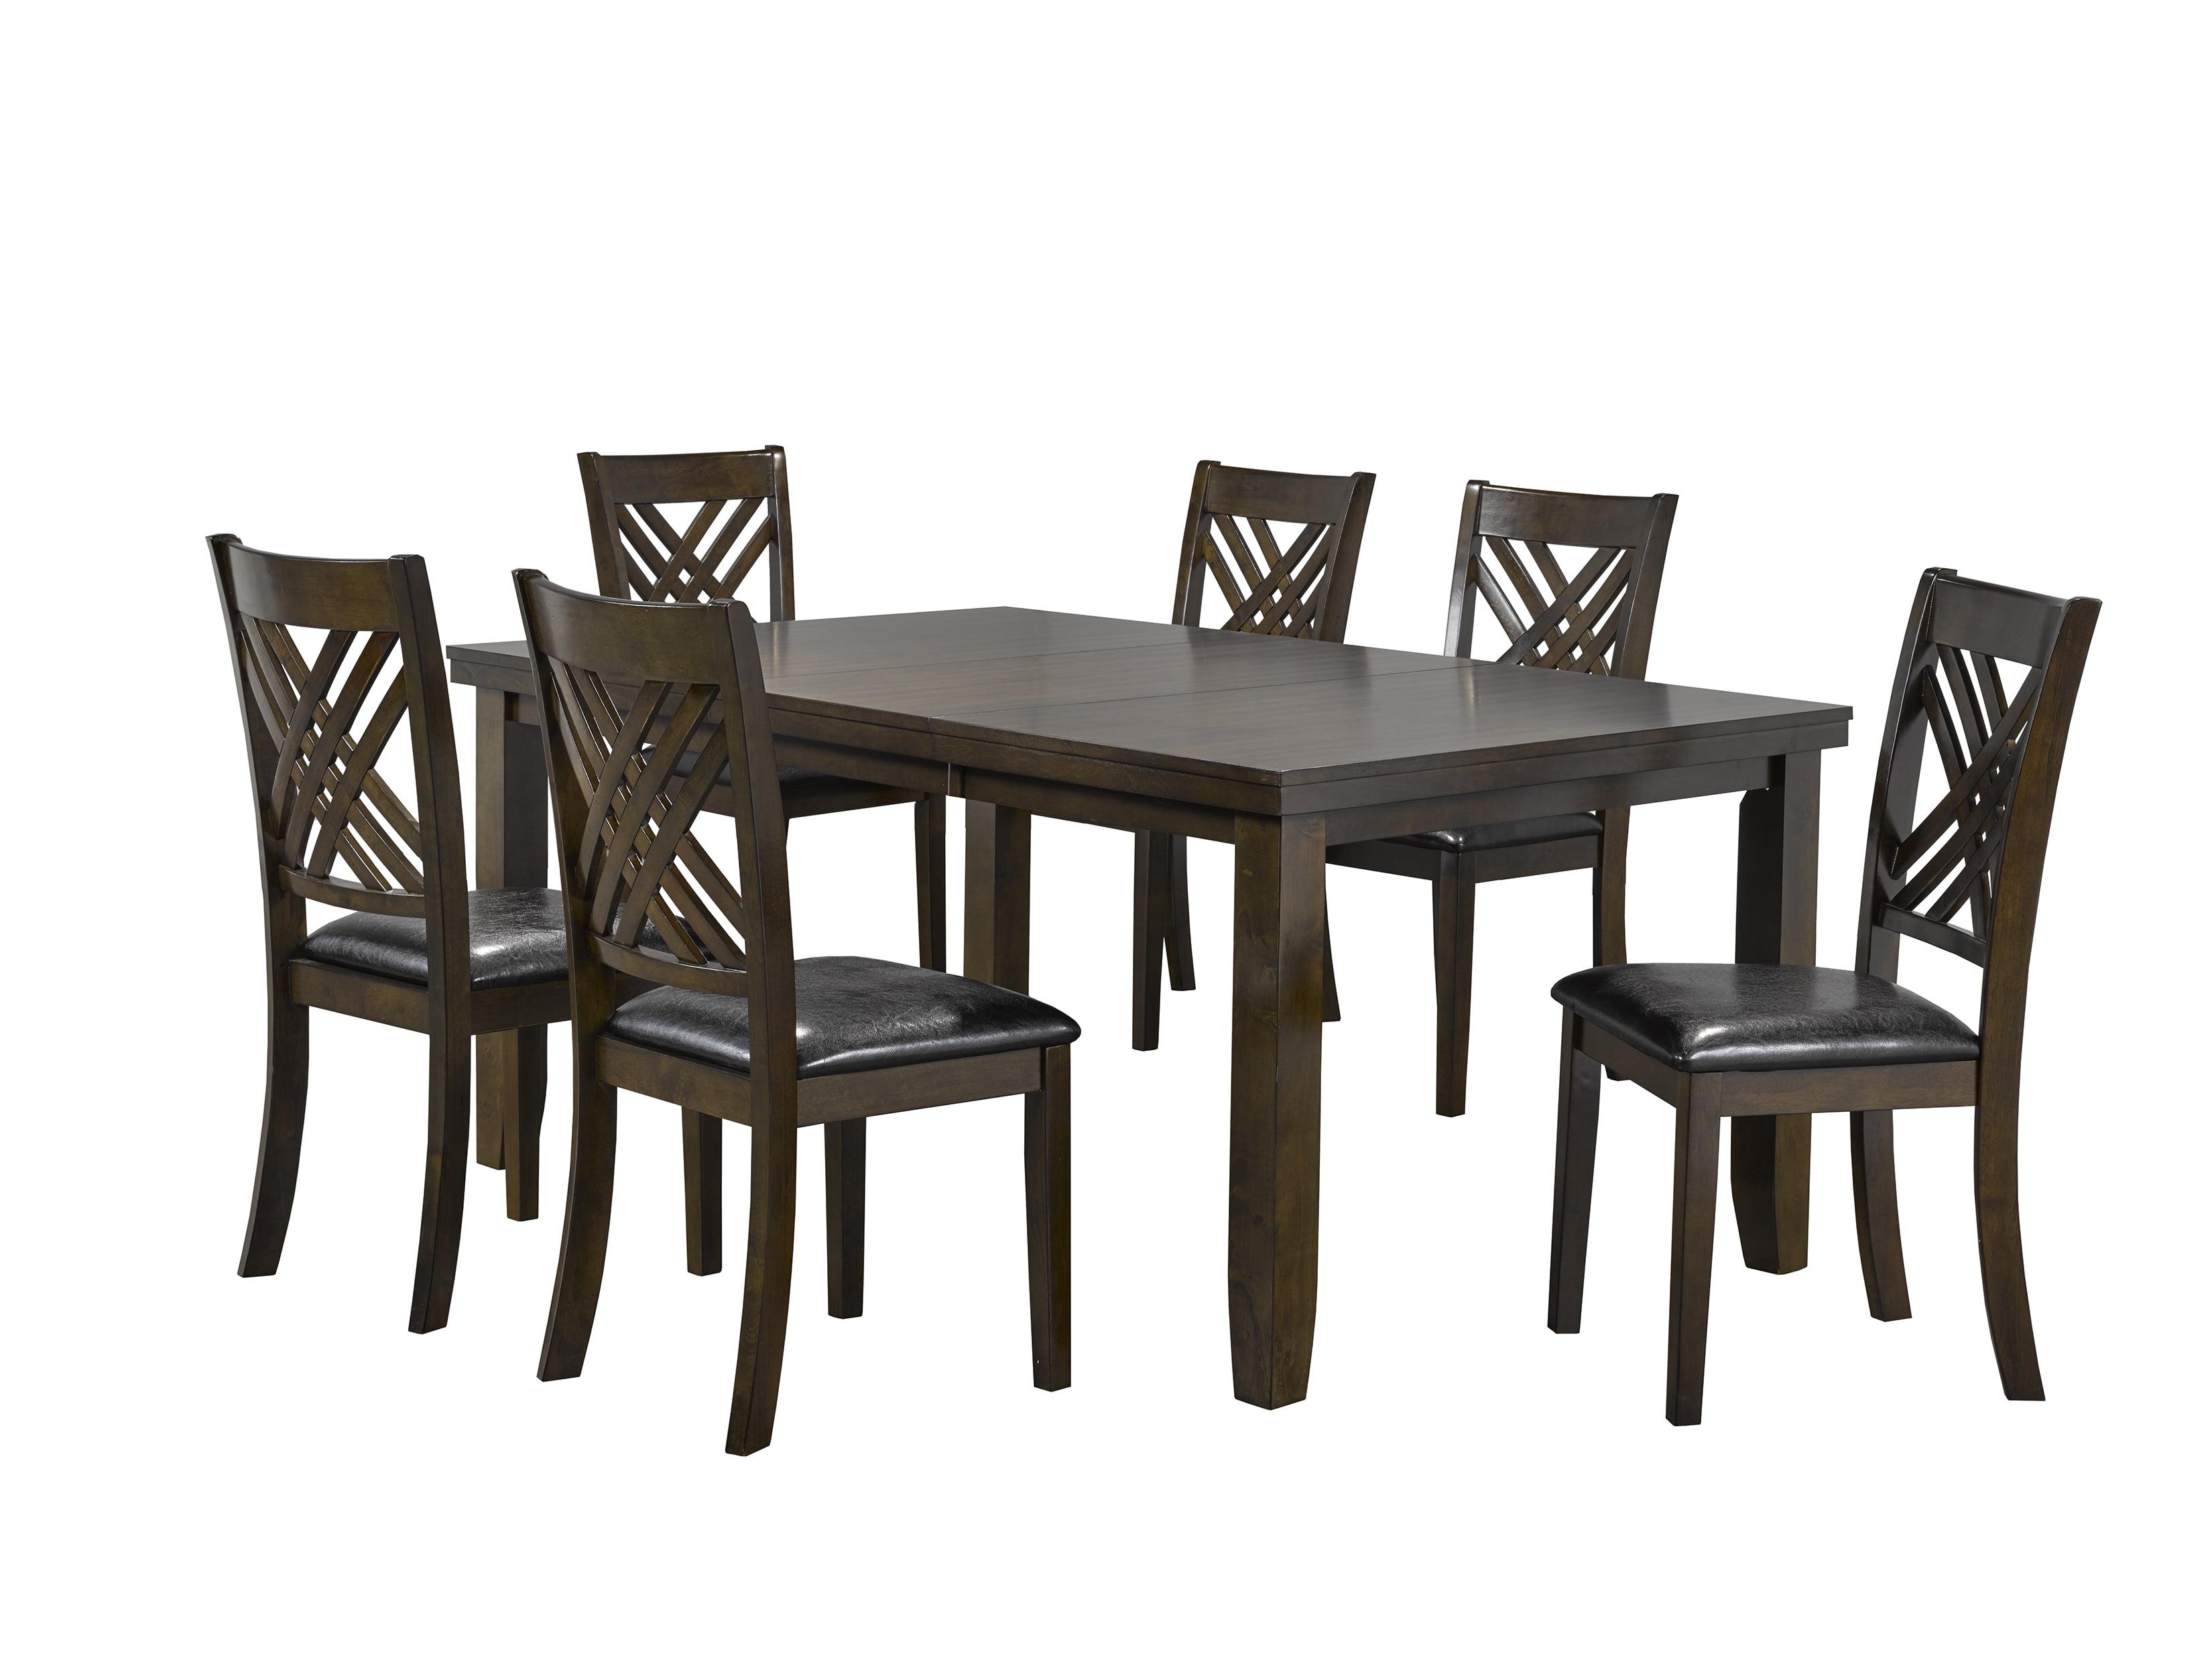 Elliott 7-Piece Dining Room Set by Brassex Inc